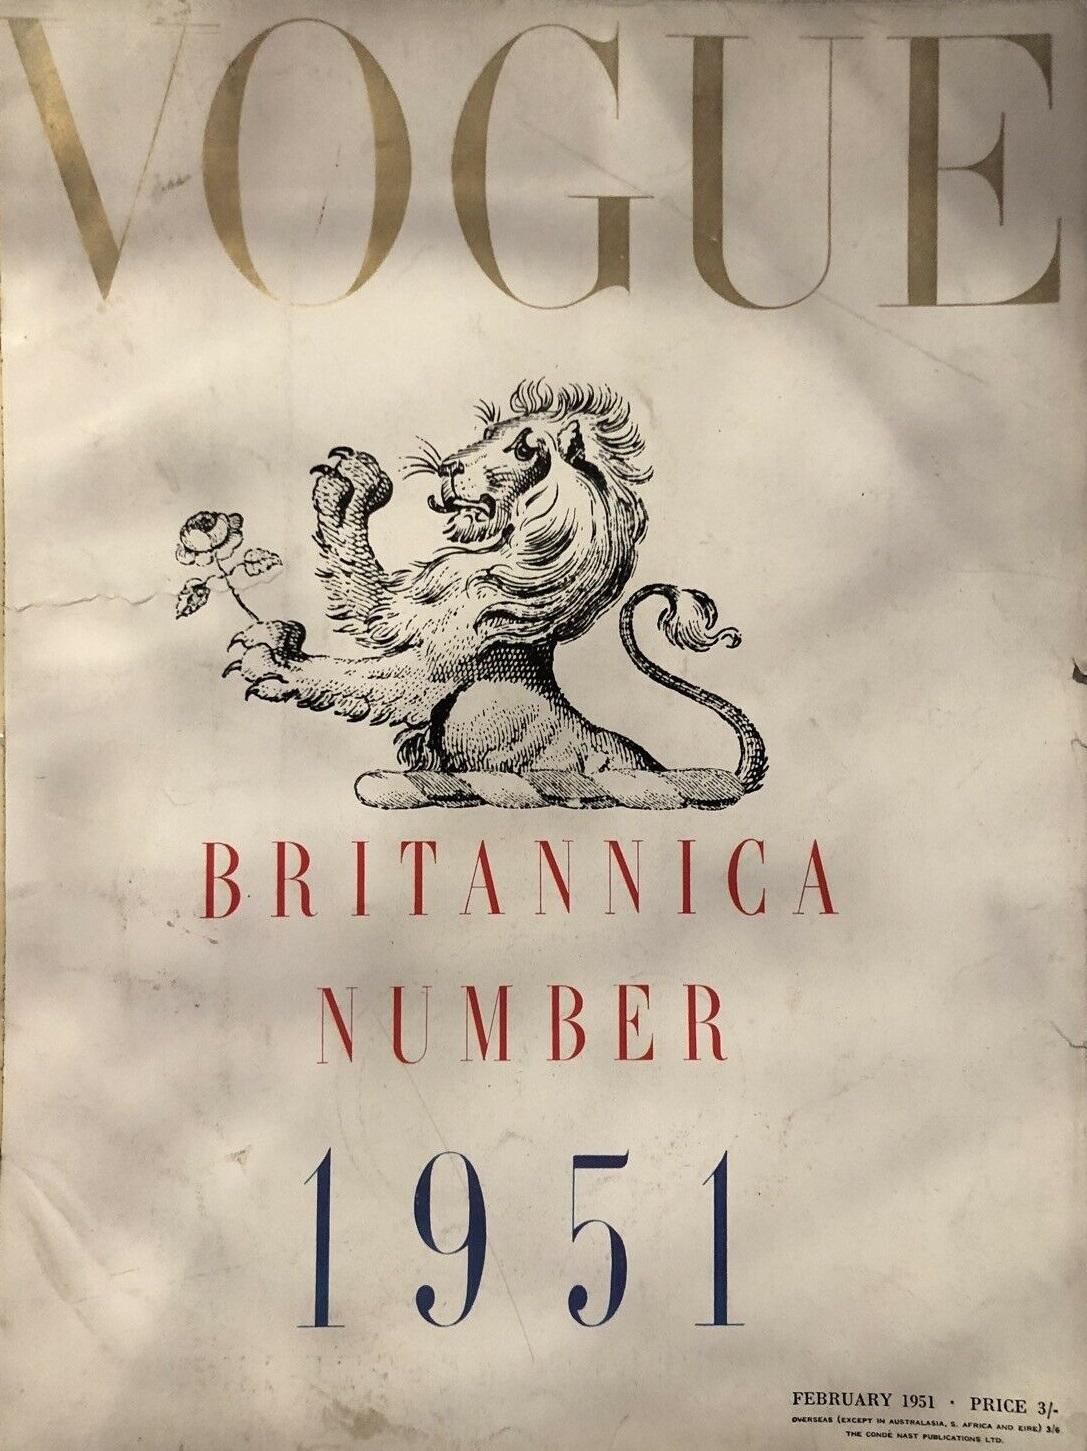 British Vogue Cover February 1951